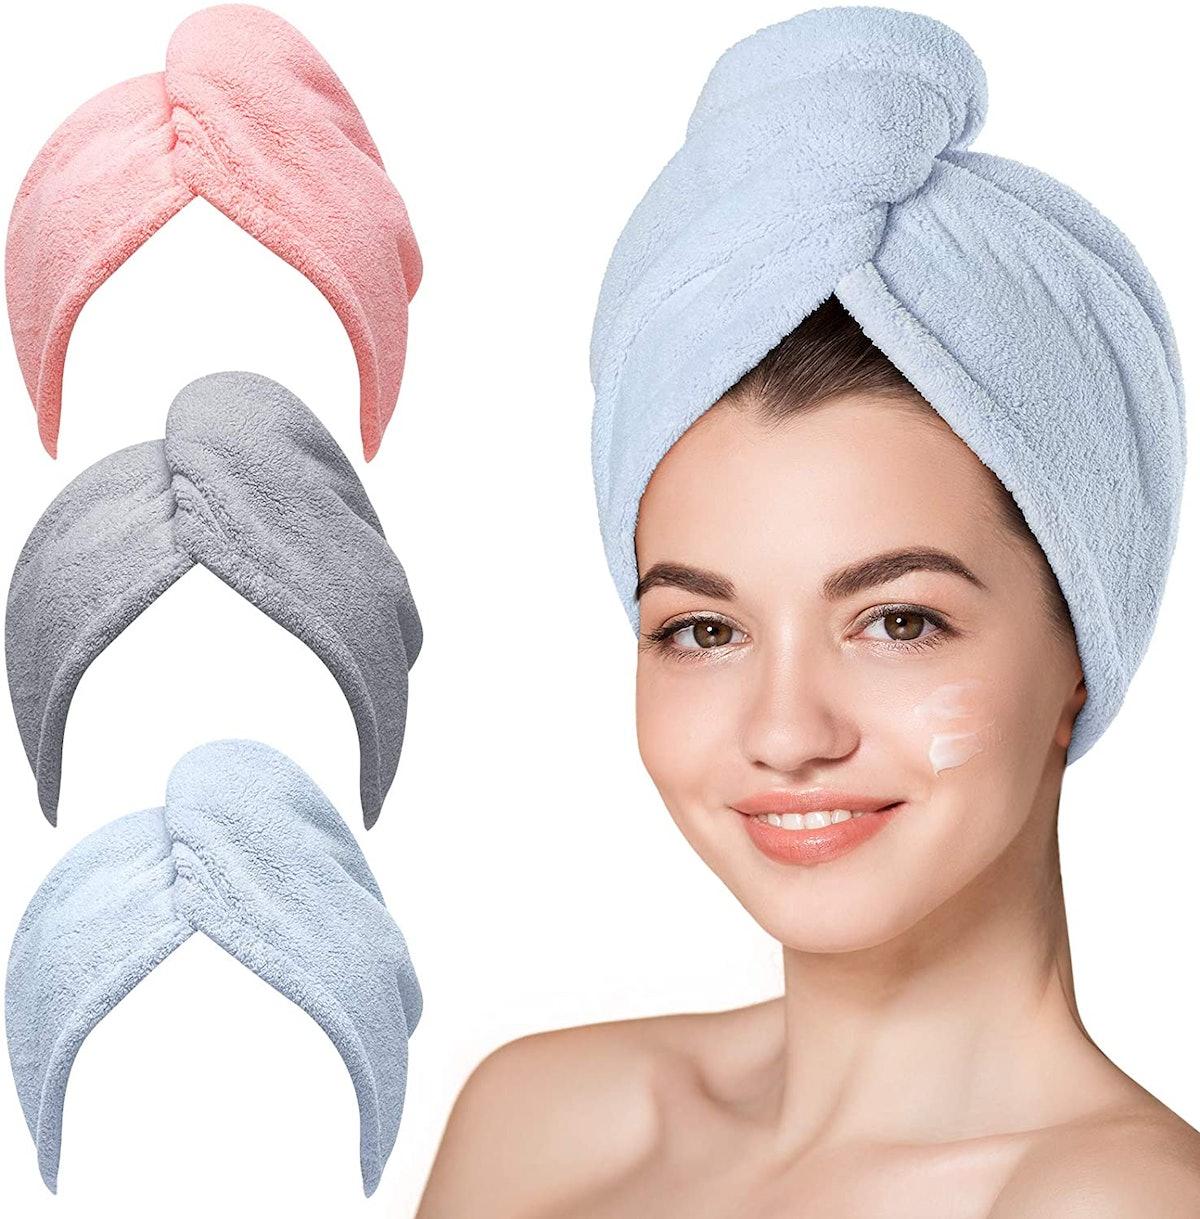 Microfiber Hair Towel (3 Pack)